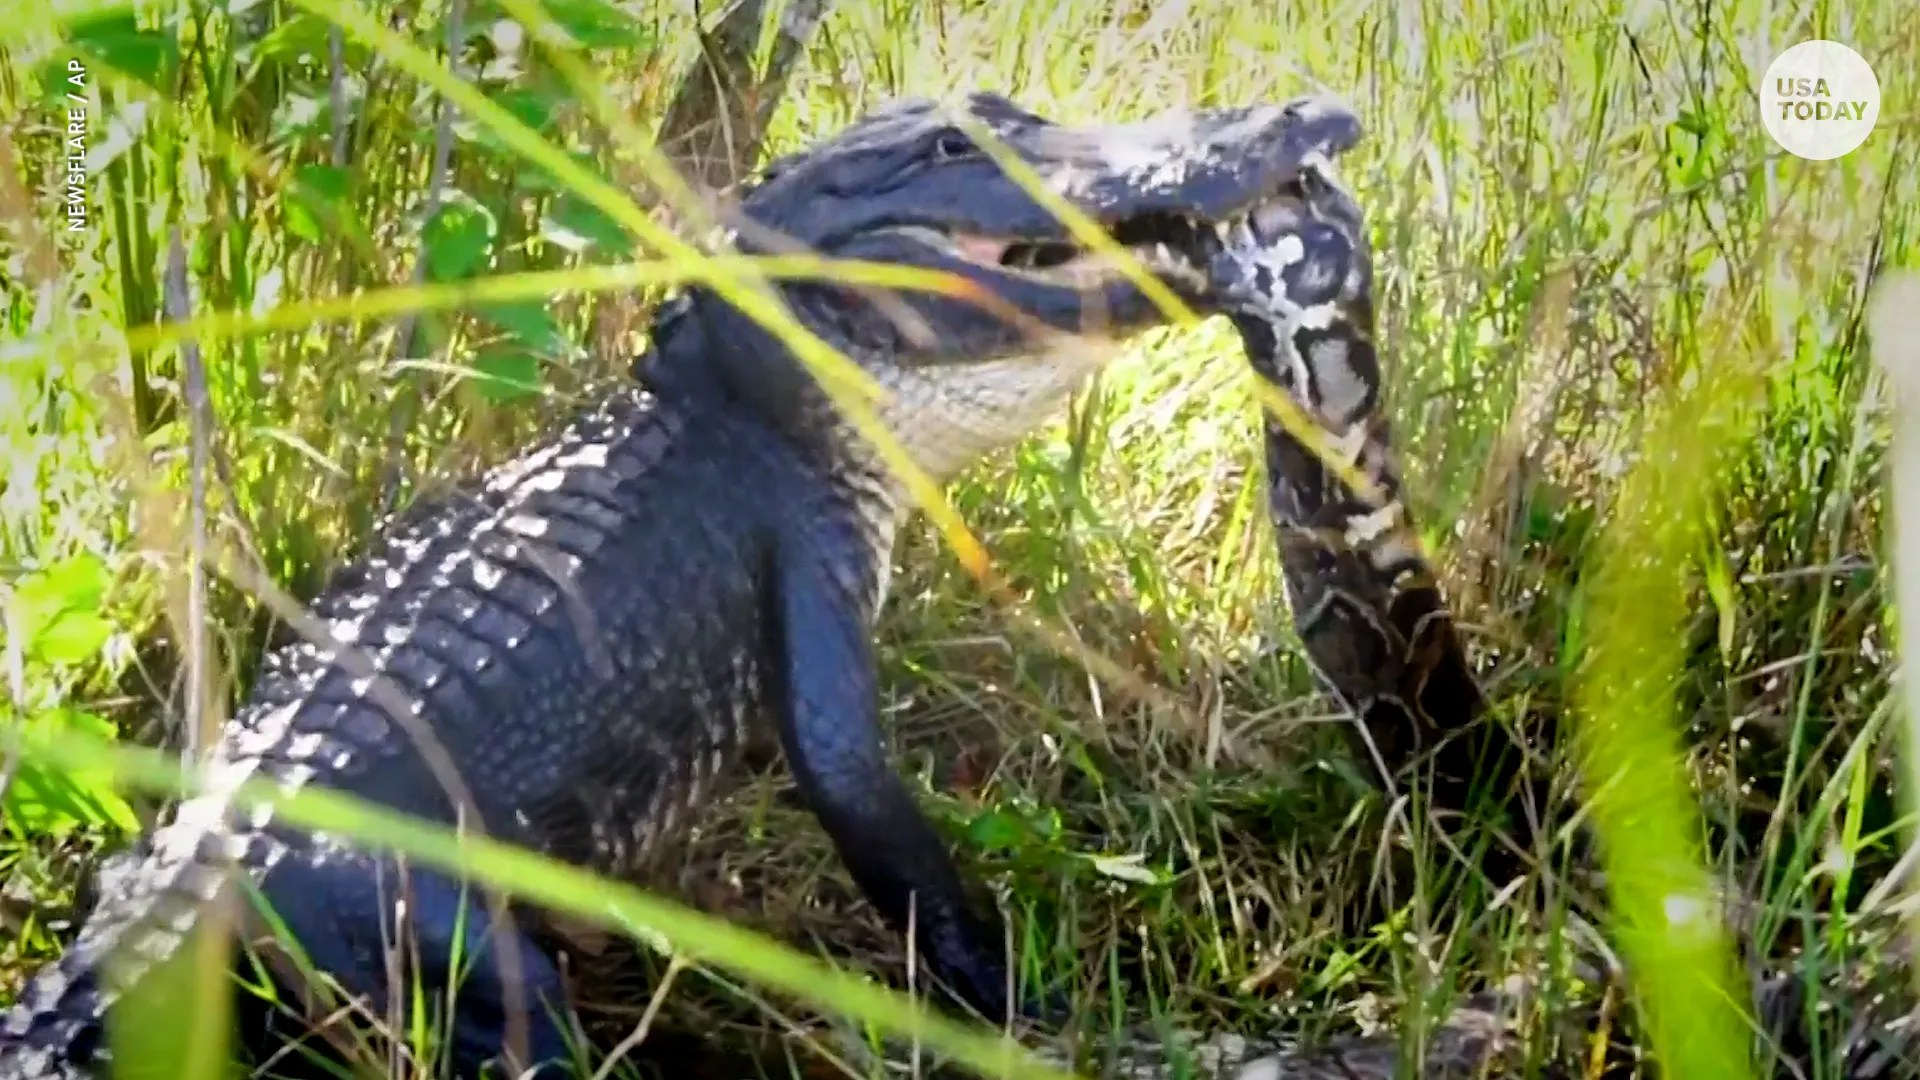 'hero' alligator gulps down invasive burmese python